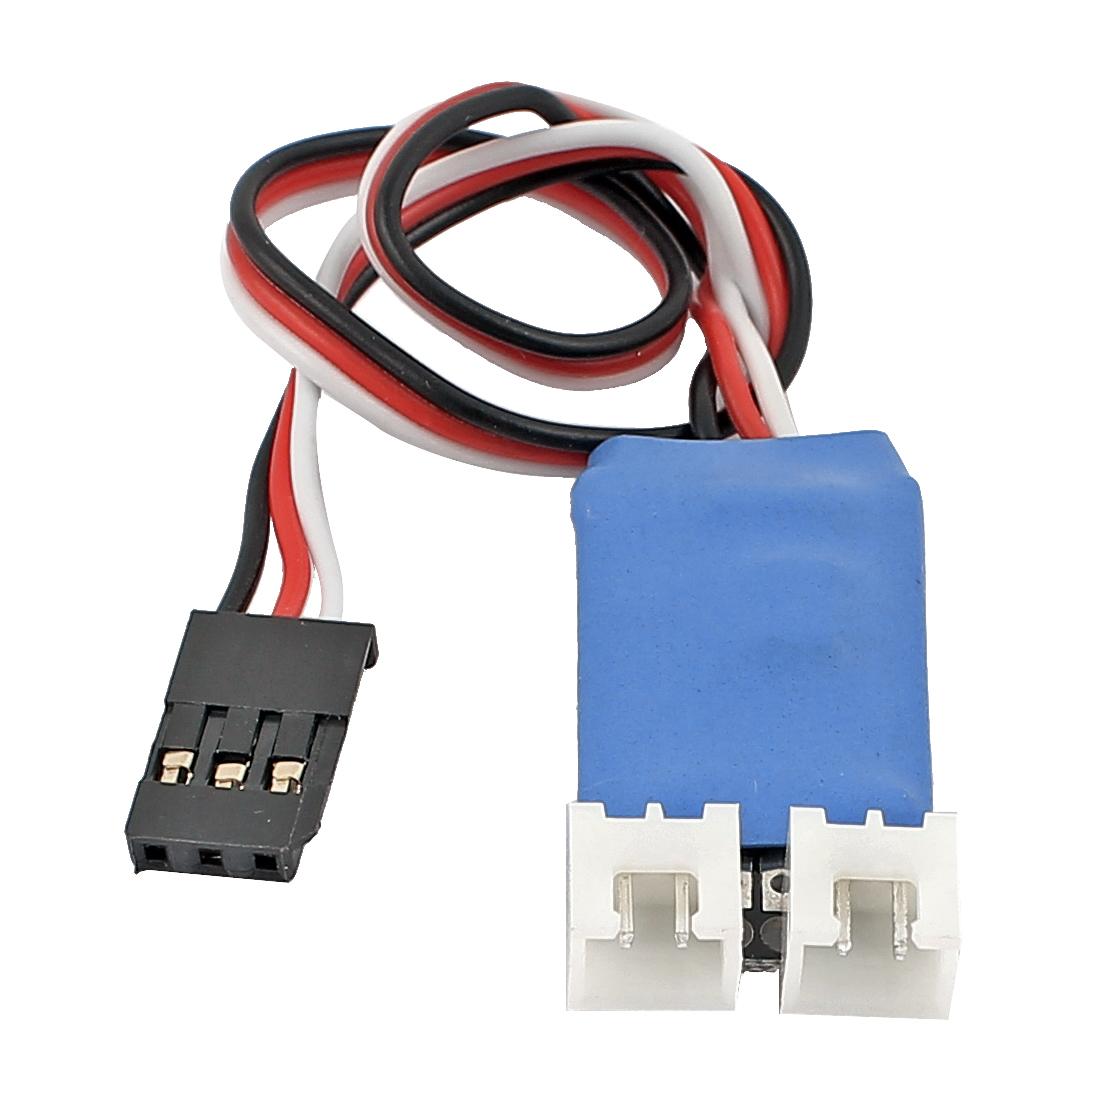 Mini Key Controller Circuit Board PCB Blue for Remote Control Car Lamp